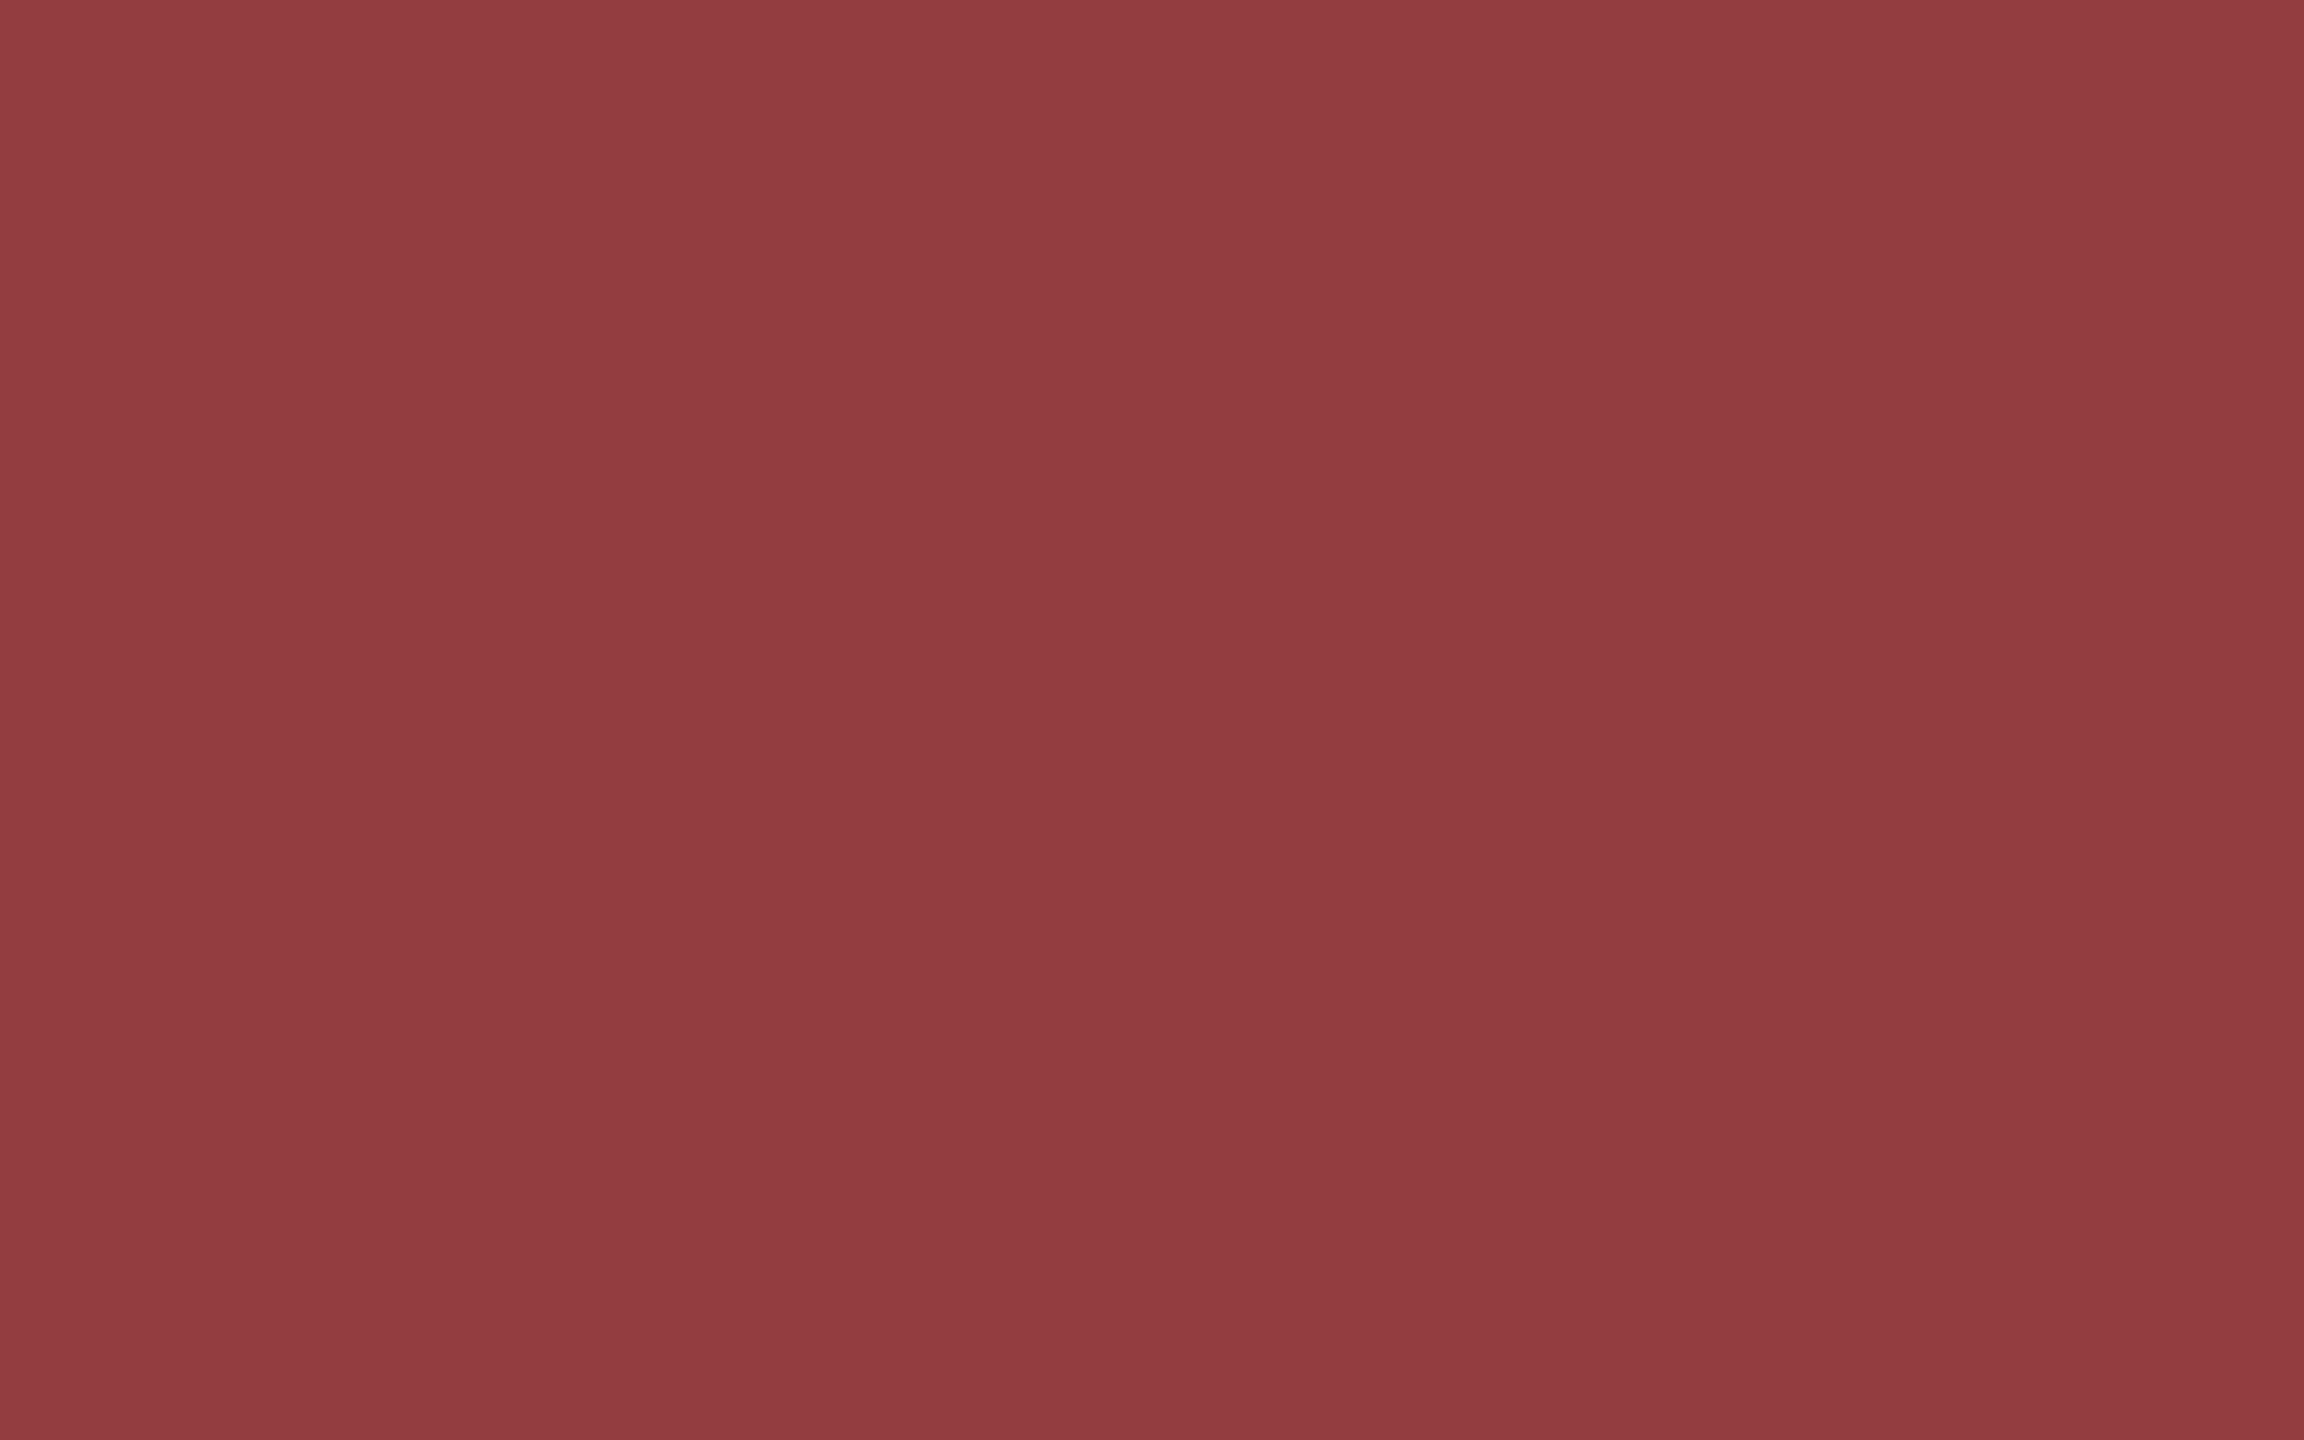 2304x1440 Smokey Topaz Solid Color Background